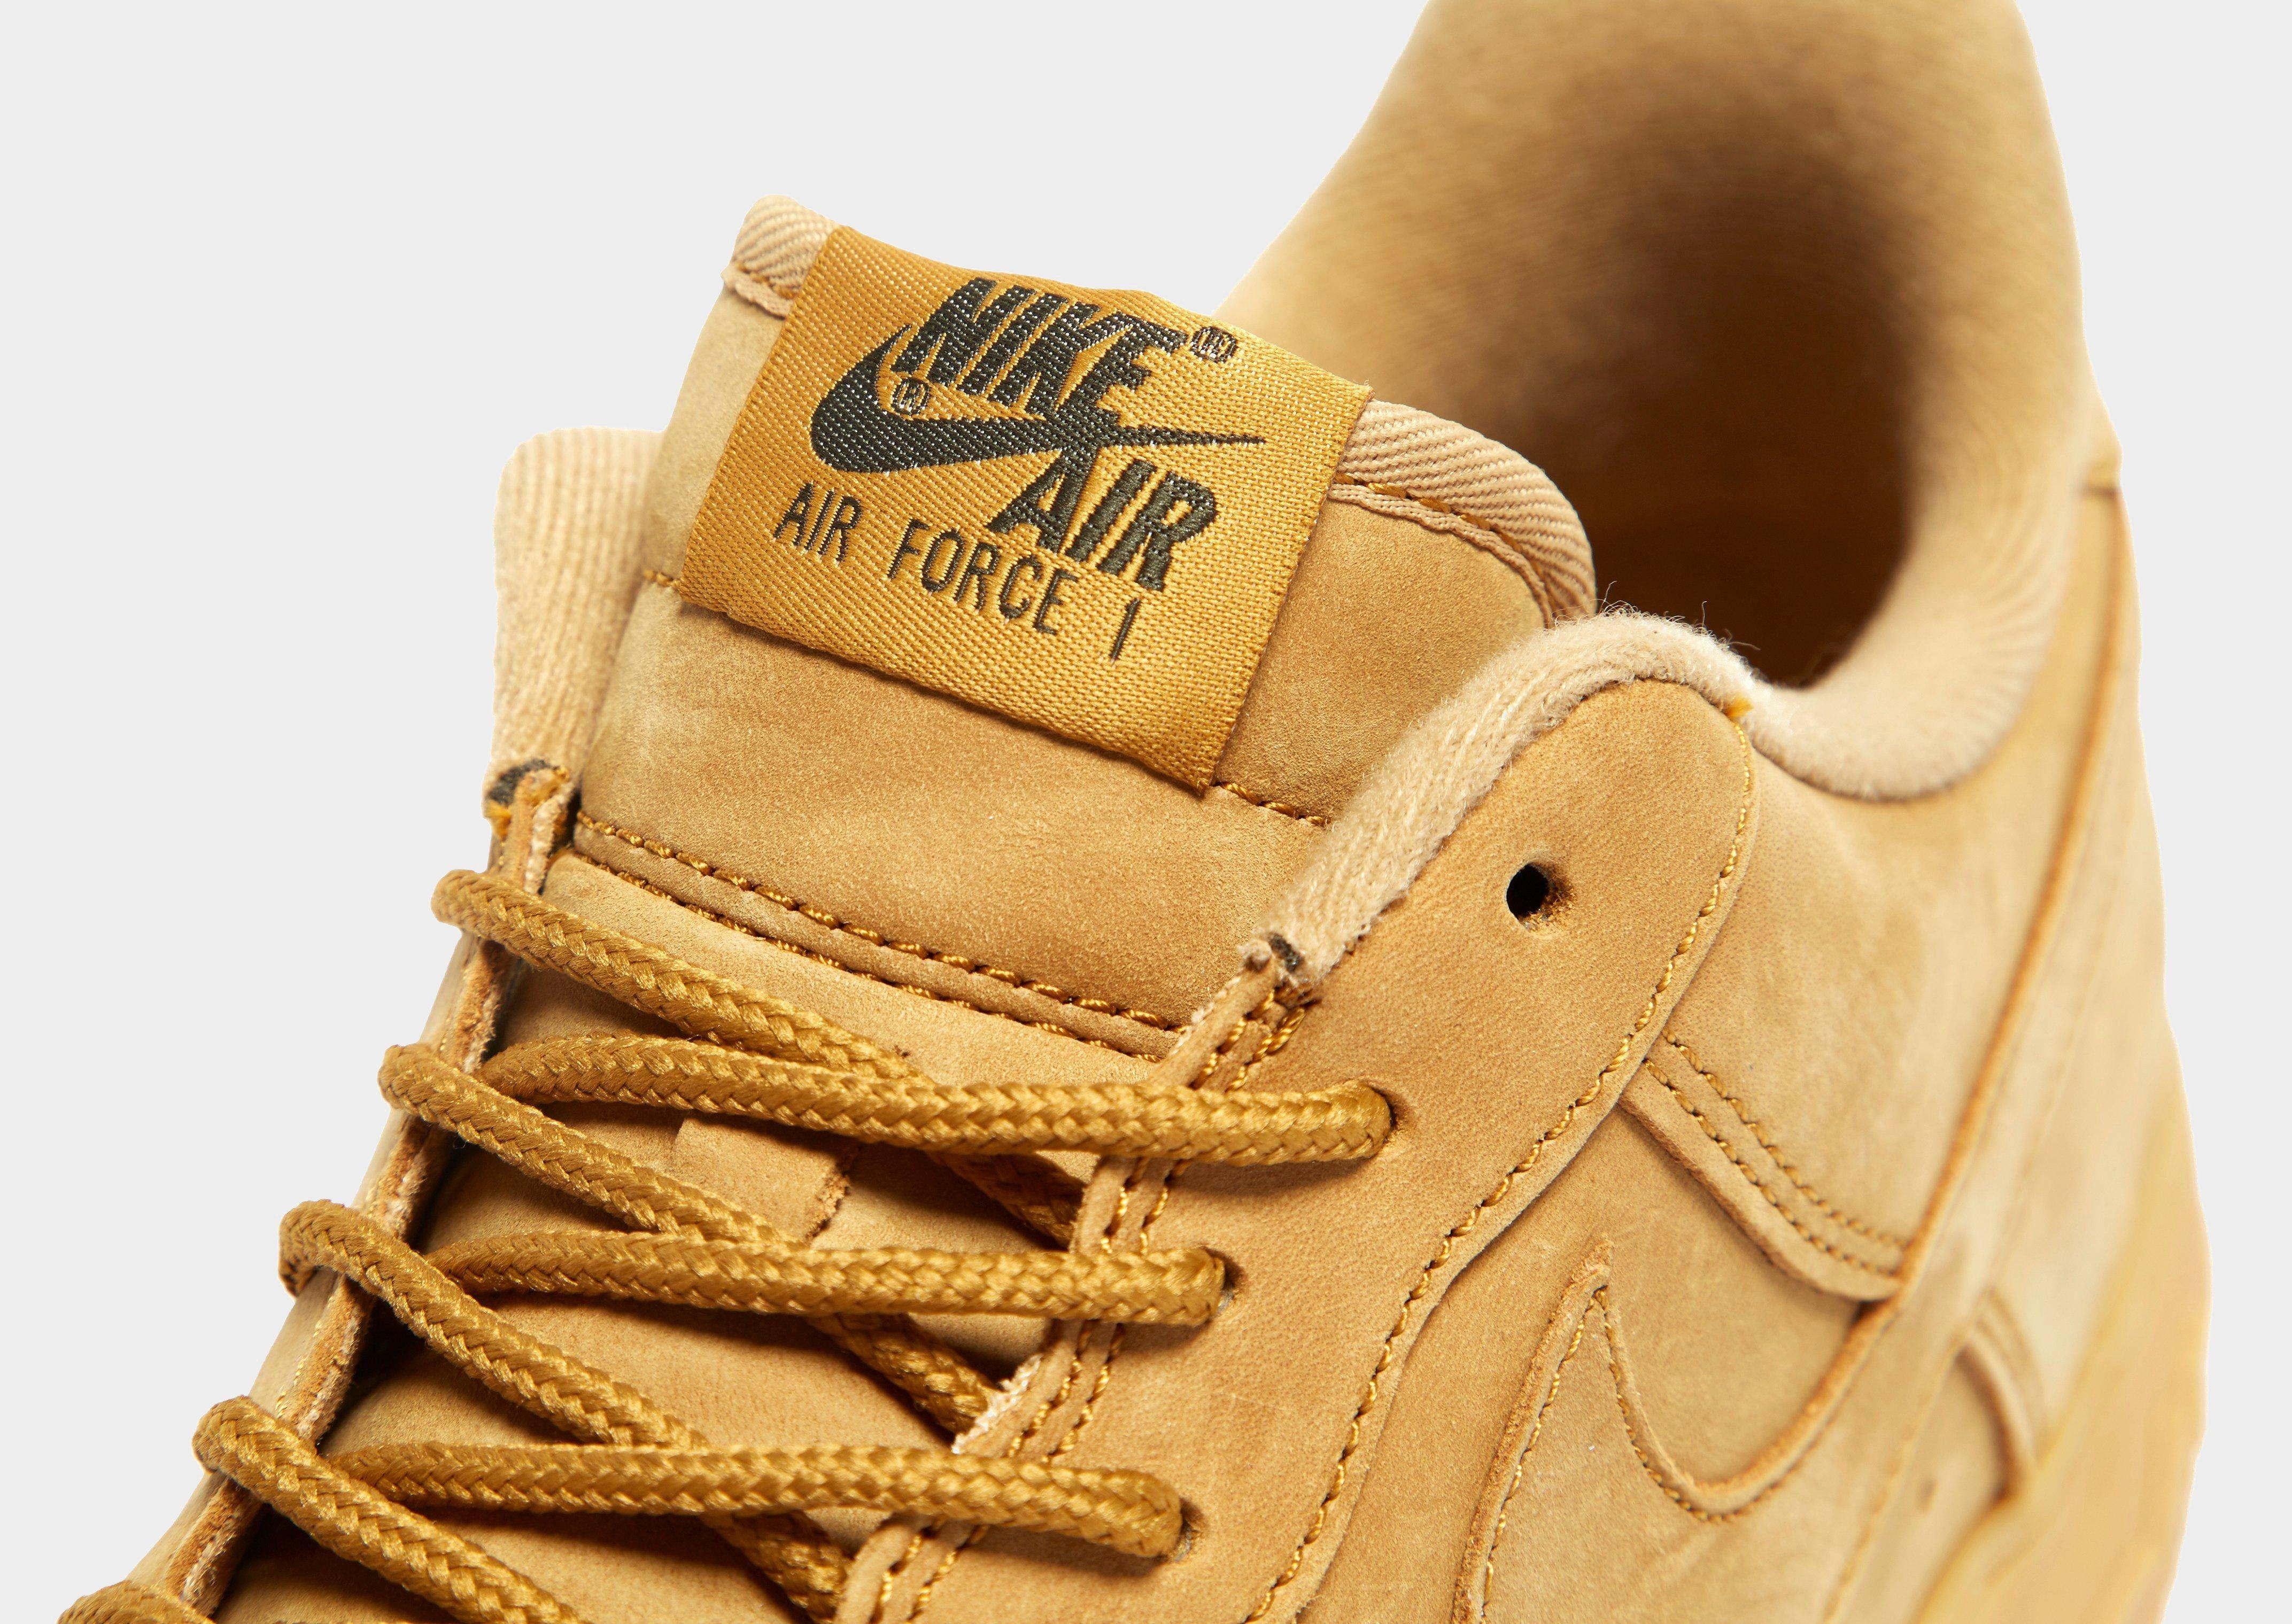 Nike Air Force 1 LV8 Flax